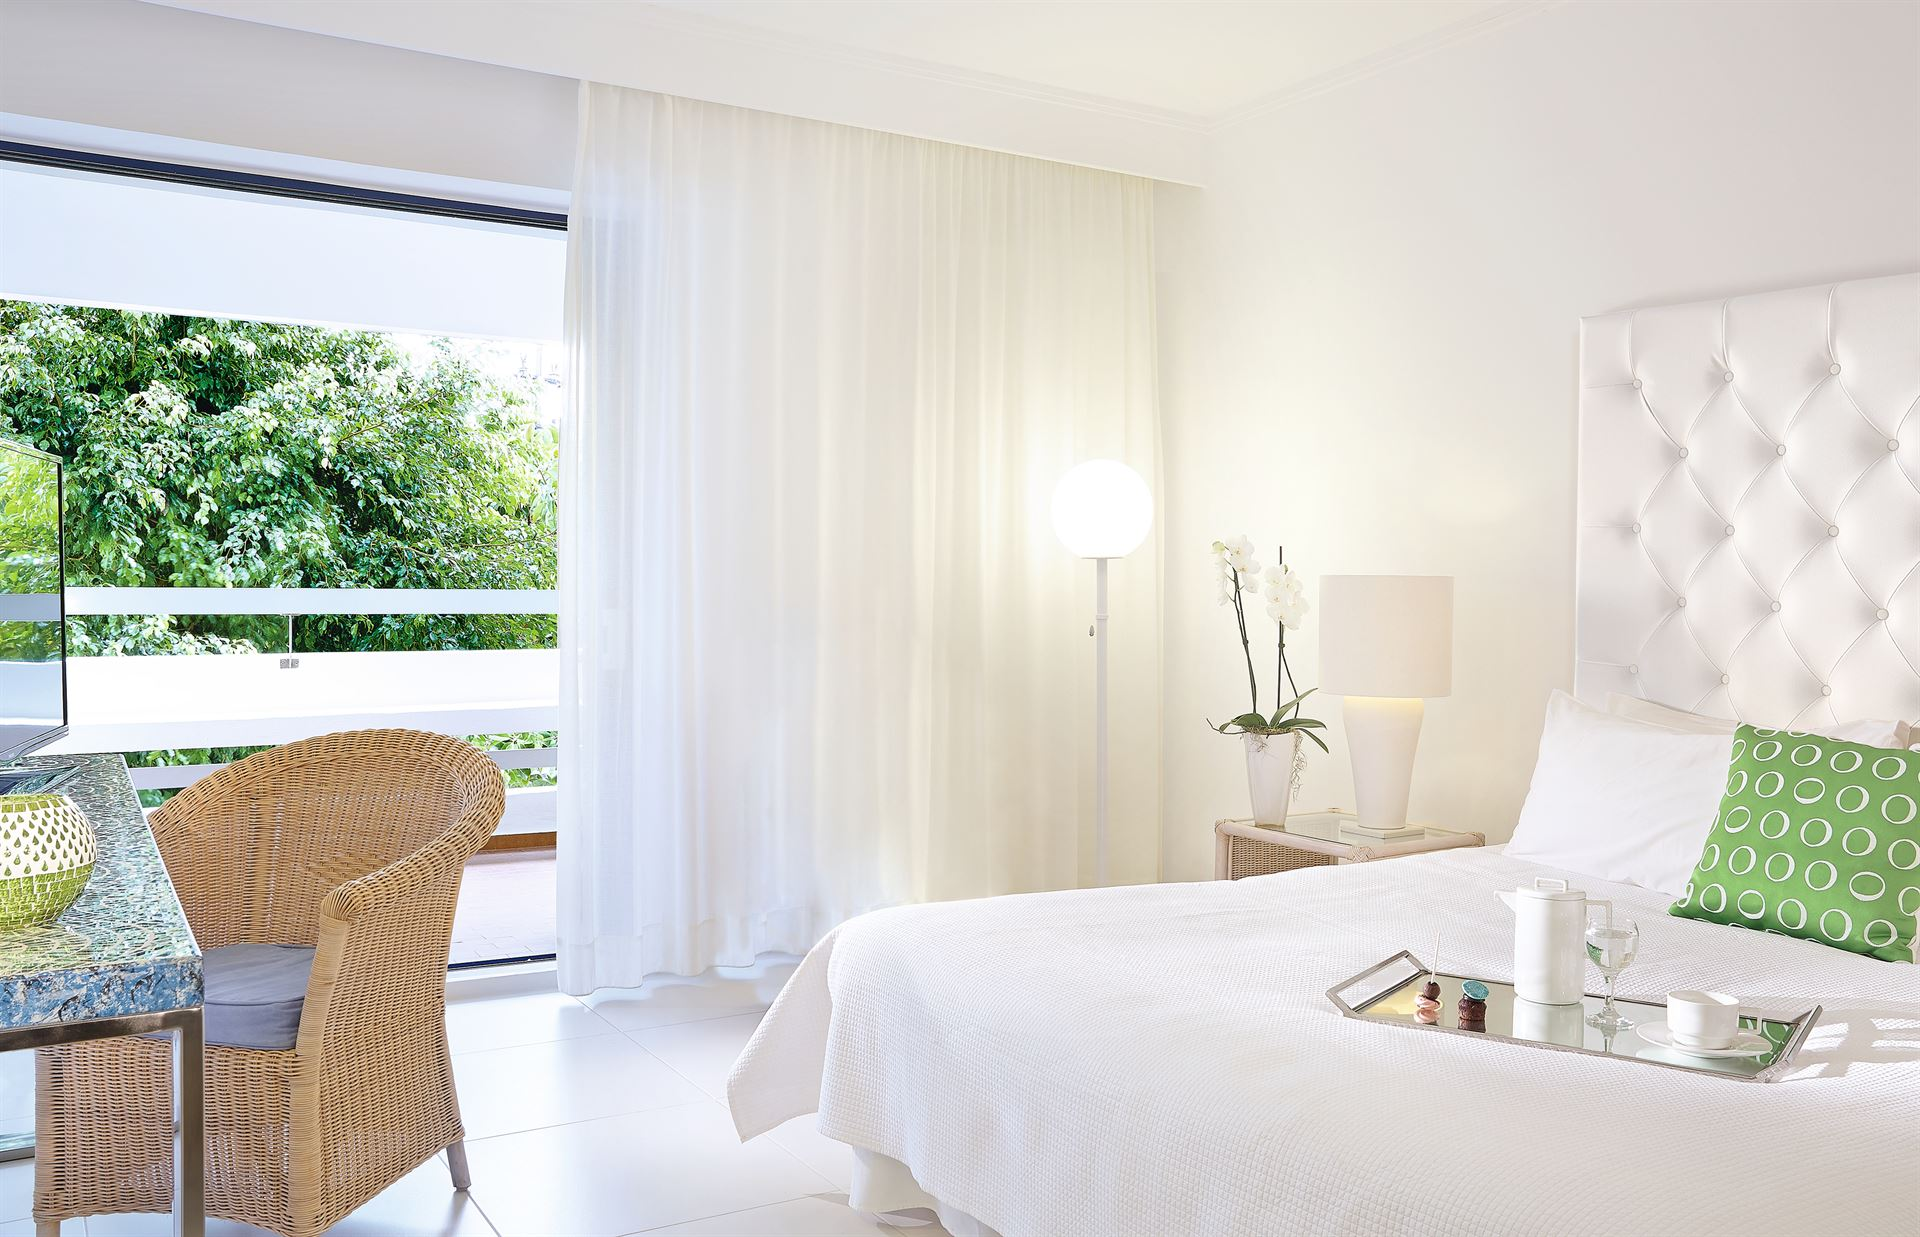 Grecotel LUX ME White Palace: Family Apartment GV or MV